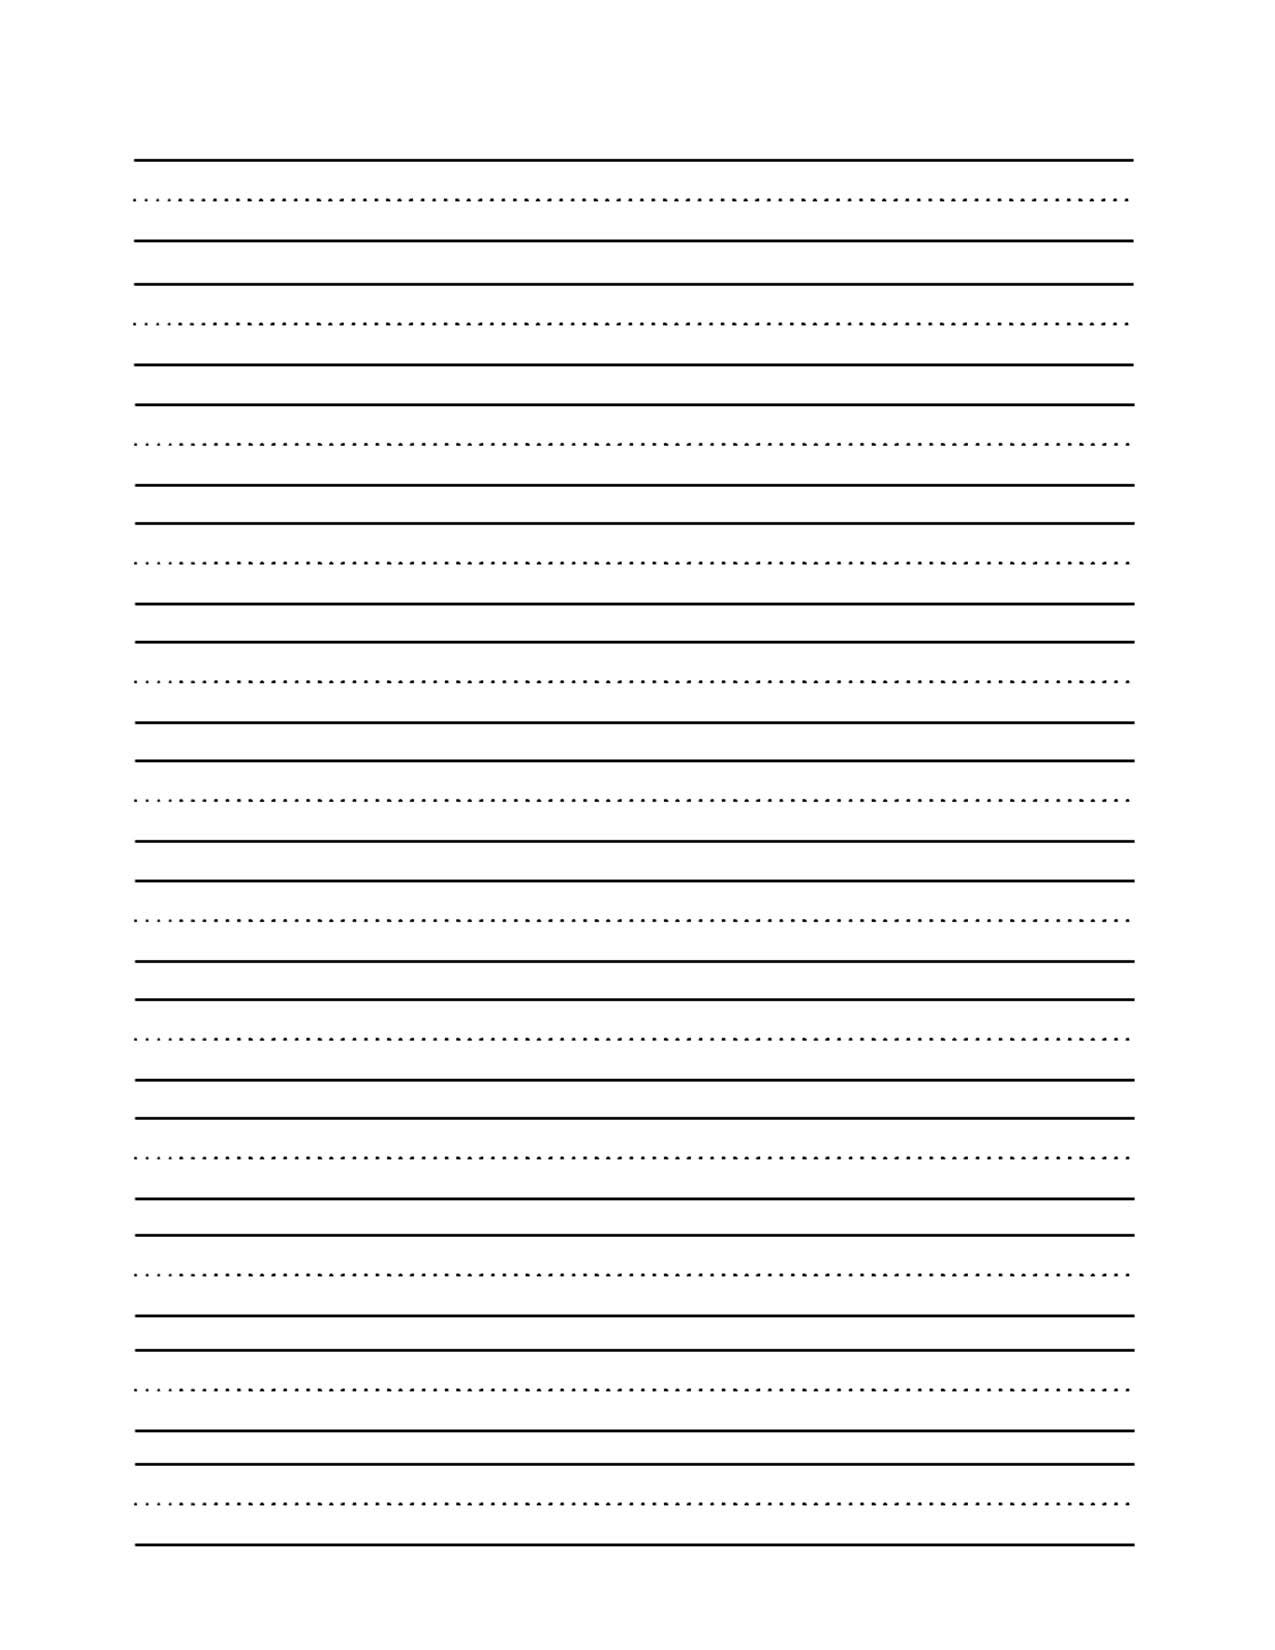 Blank Writing Sheets - Karis.sticken.co | Printable Blank Handwriting Worksheets